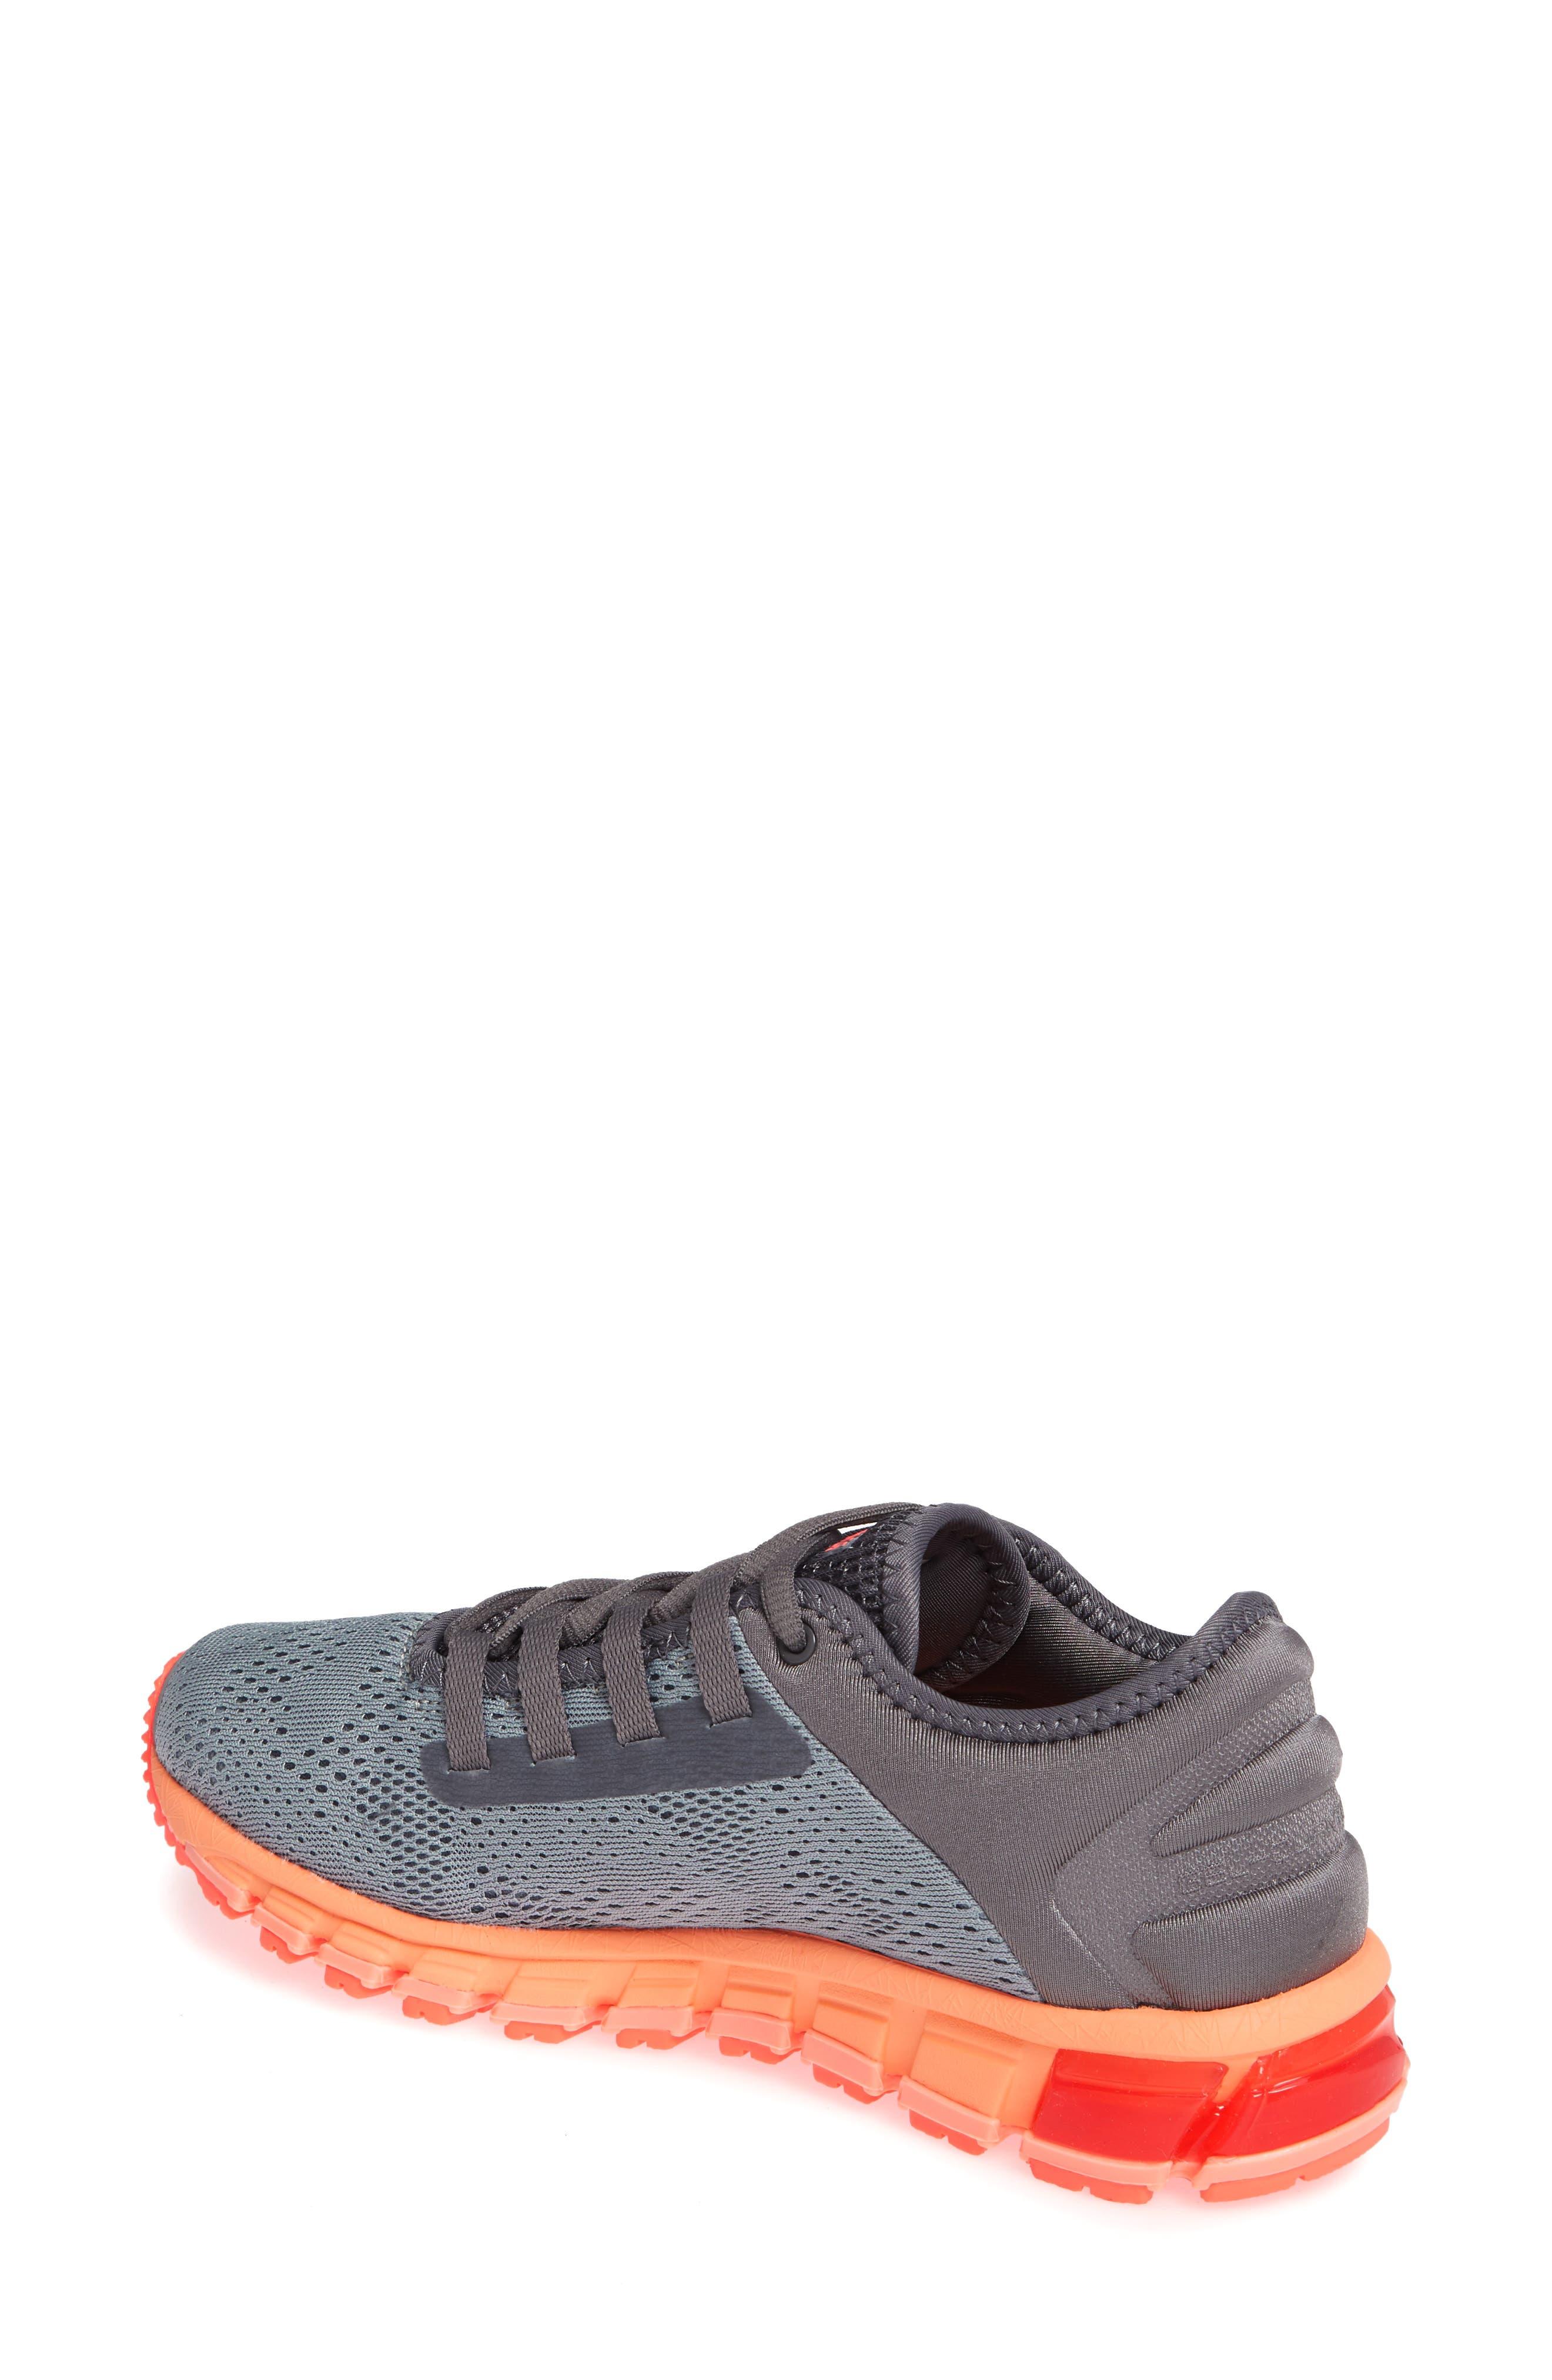 GEL Quantum 180 3 Running Shoe,                             Alternate thumbnail 2, color,                             STONE GREY/ CARBON